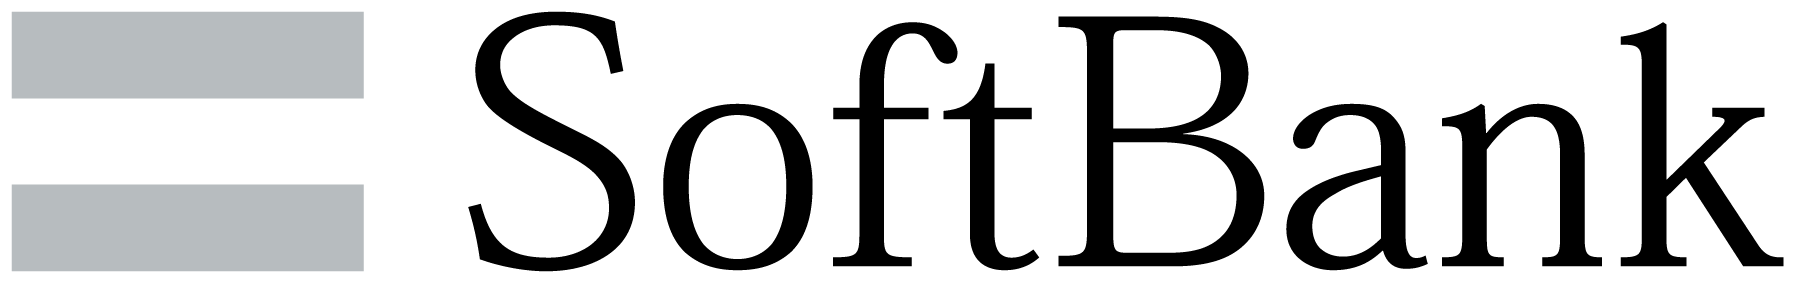 SoftBank ロゴ